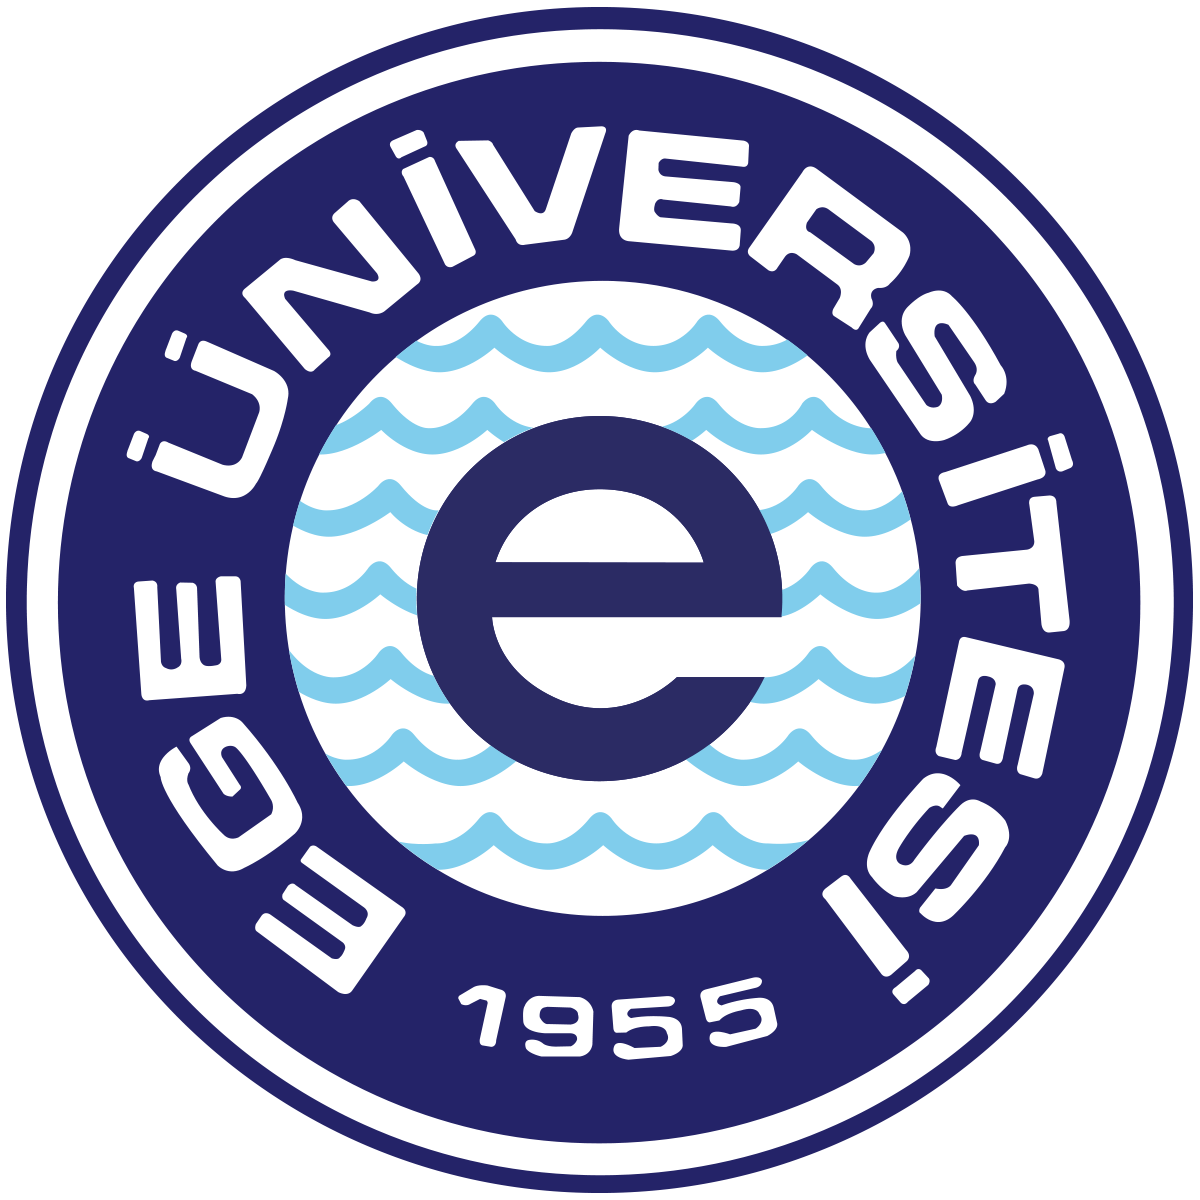 Ege University